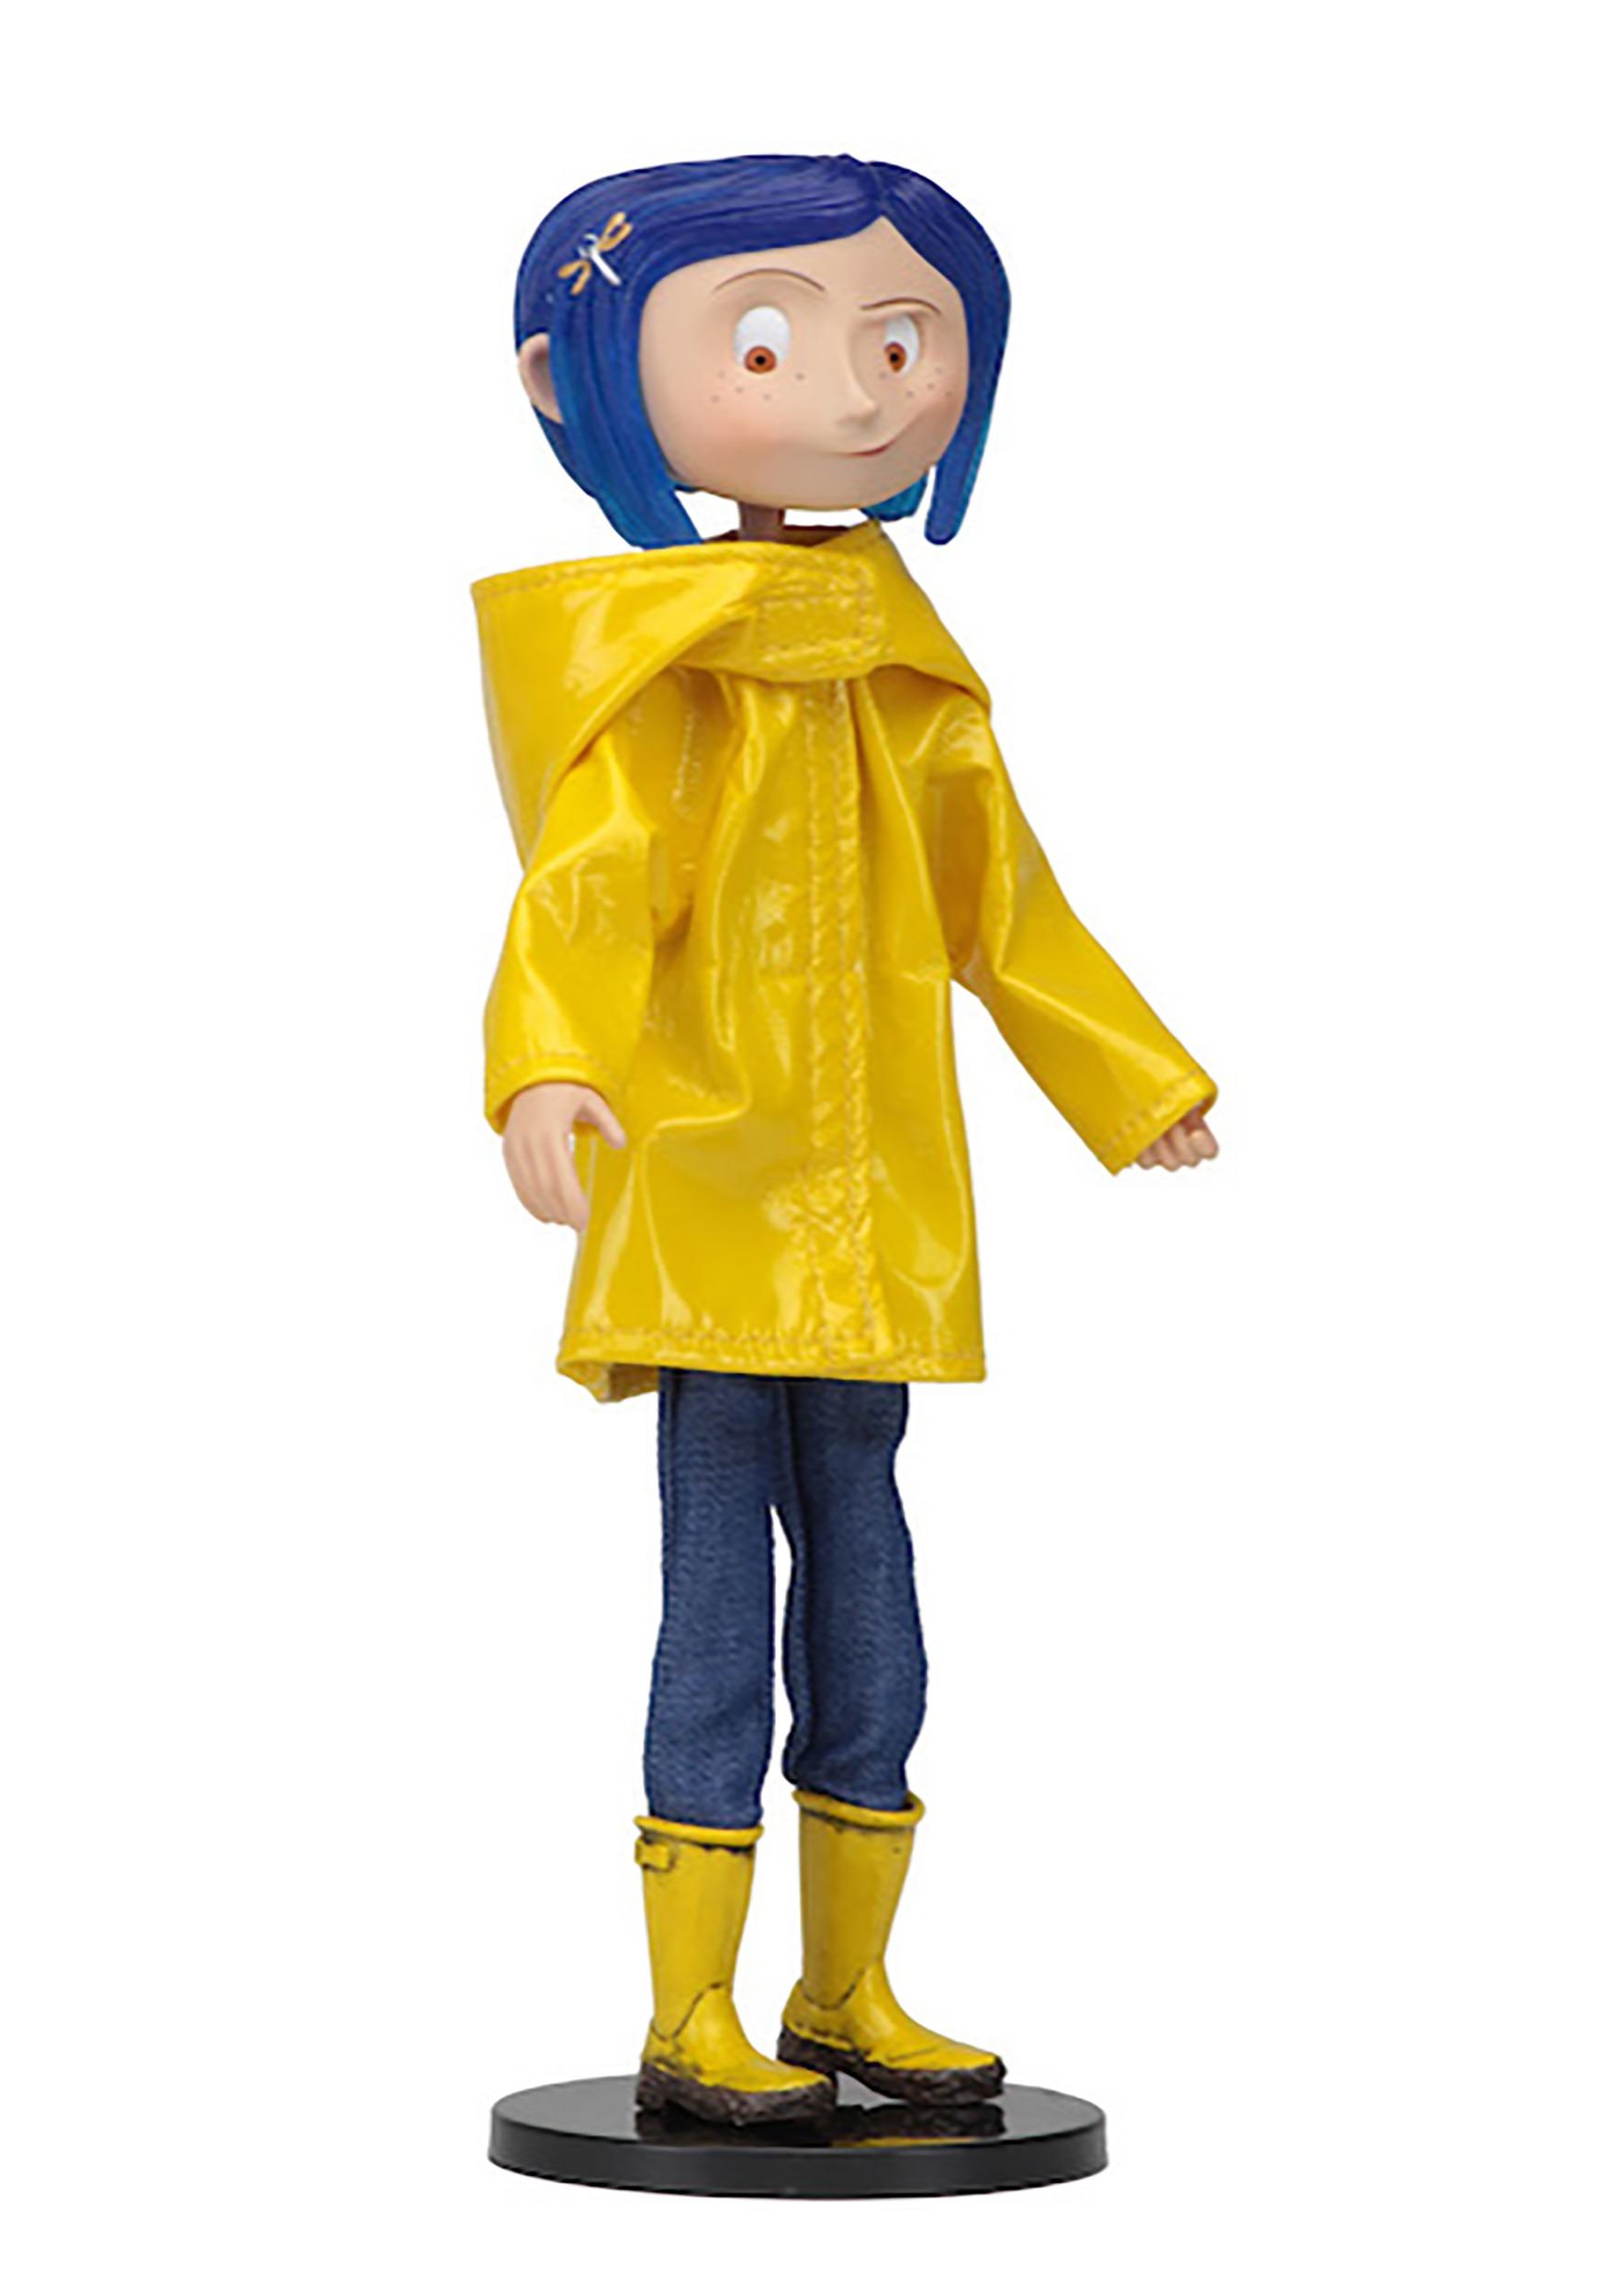 7 Coraline In Raincoat Articulated Figure